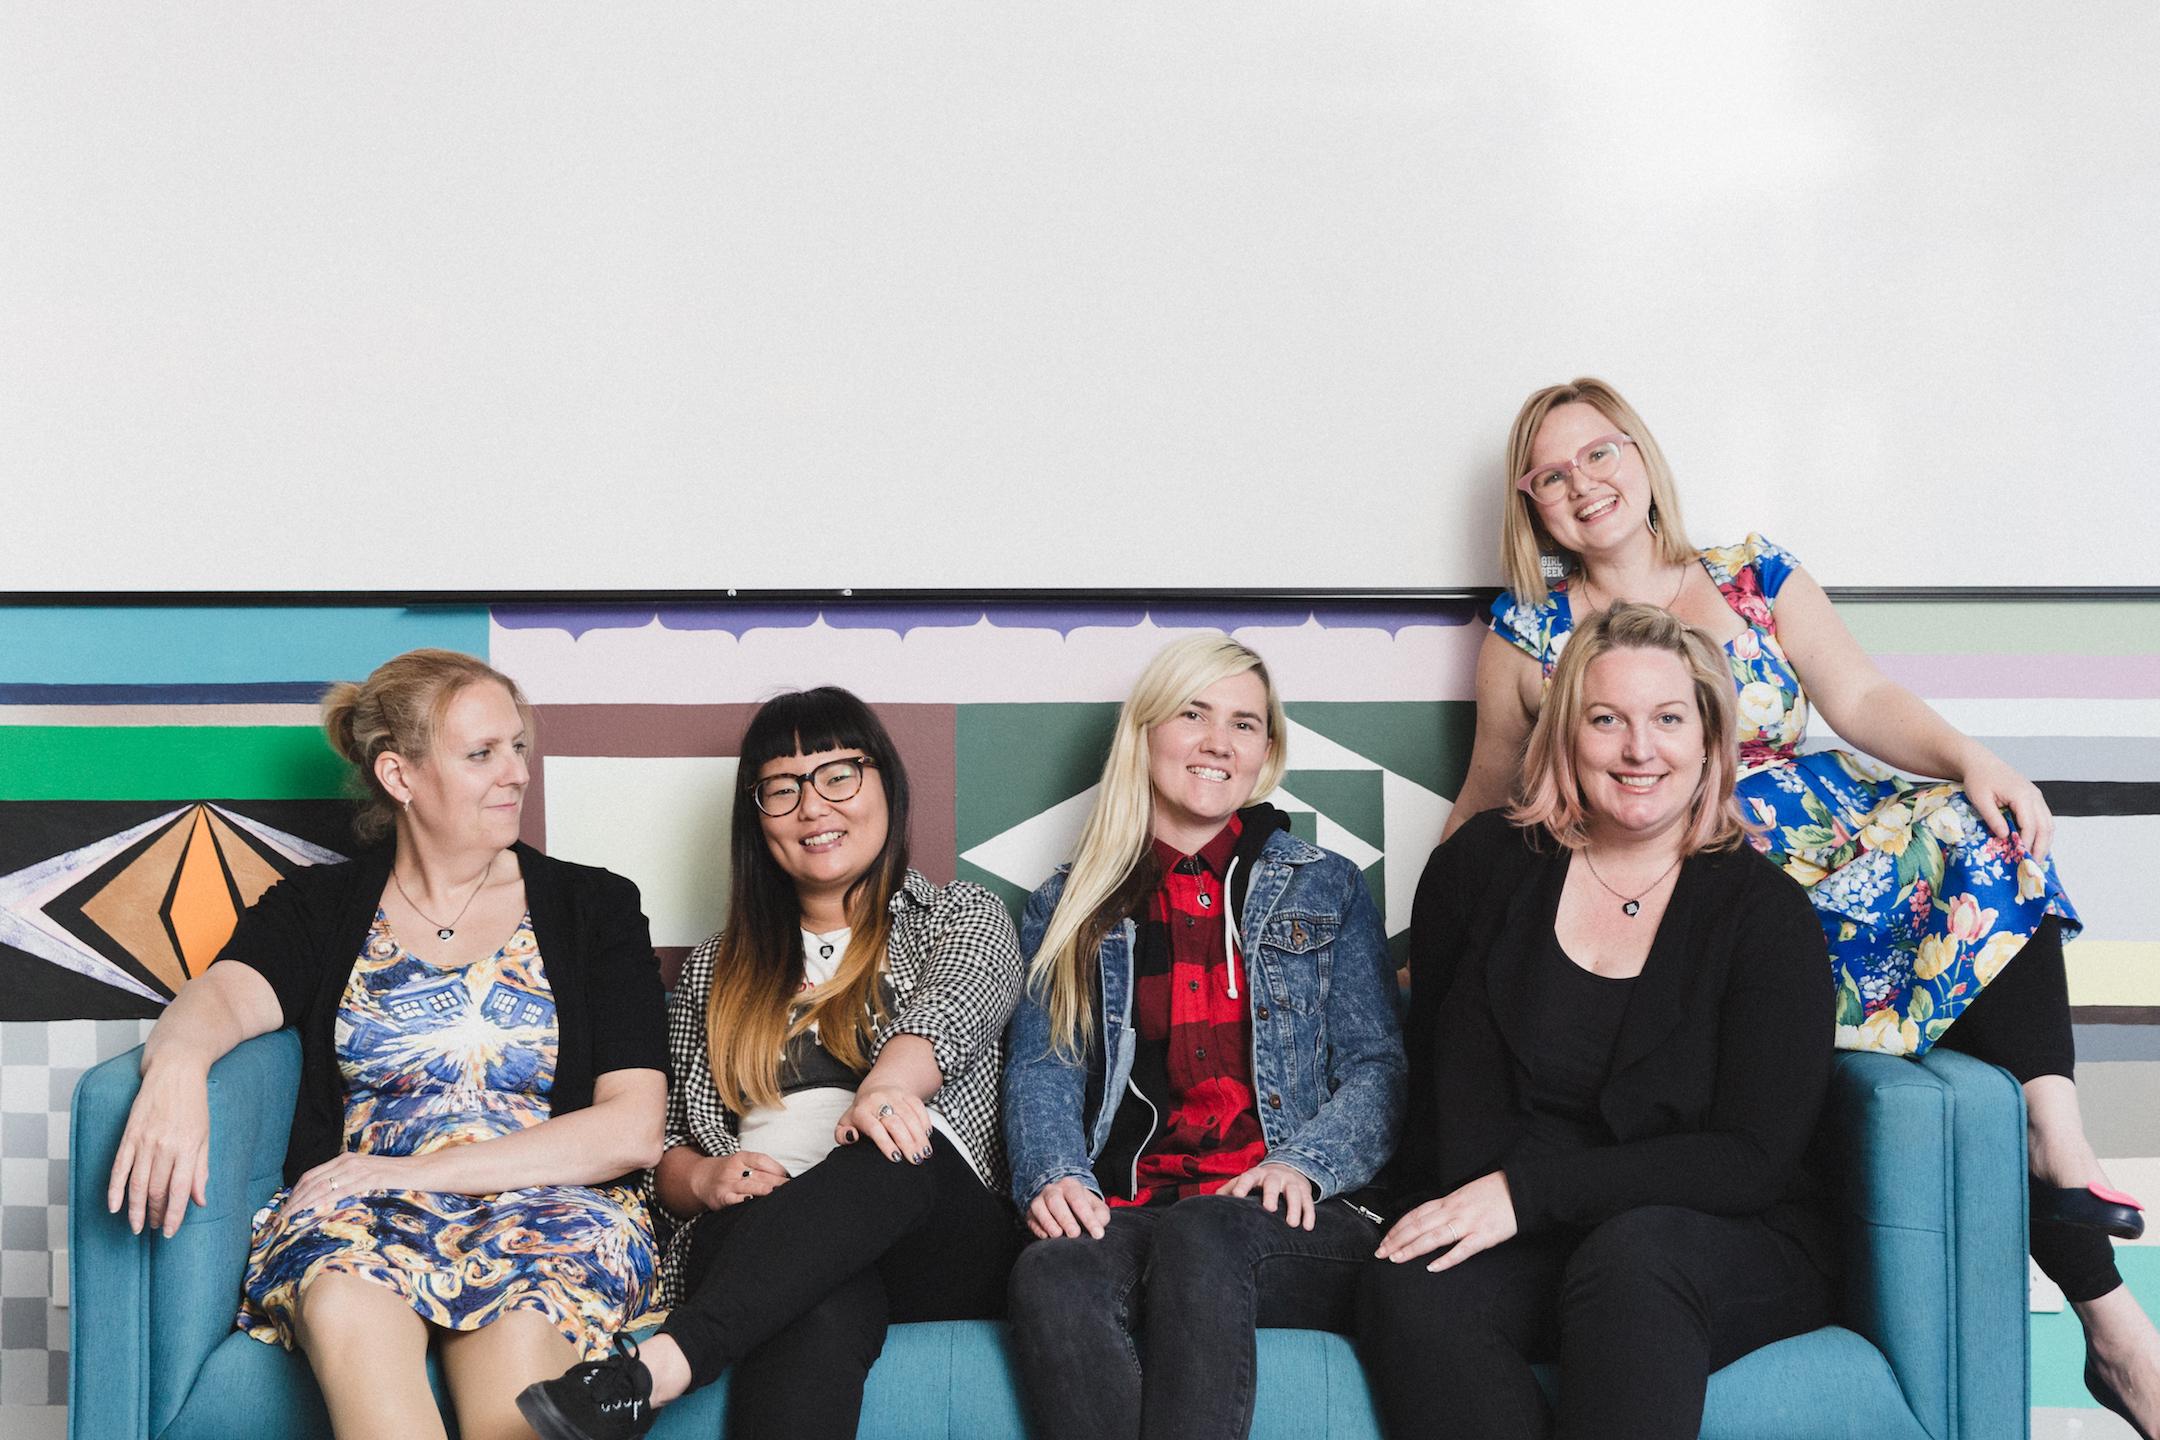 Girl Geek Academy Co-Founders (L-R): April Staines, Lisy Kane, Tammy Butow, Amanda Watts, Sarah Moran